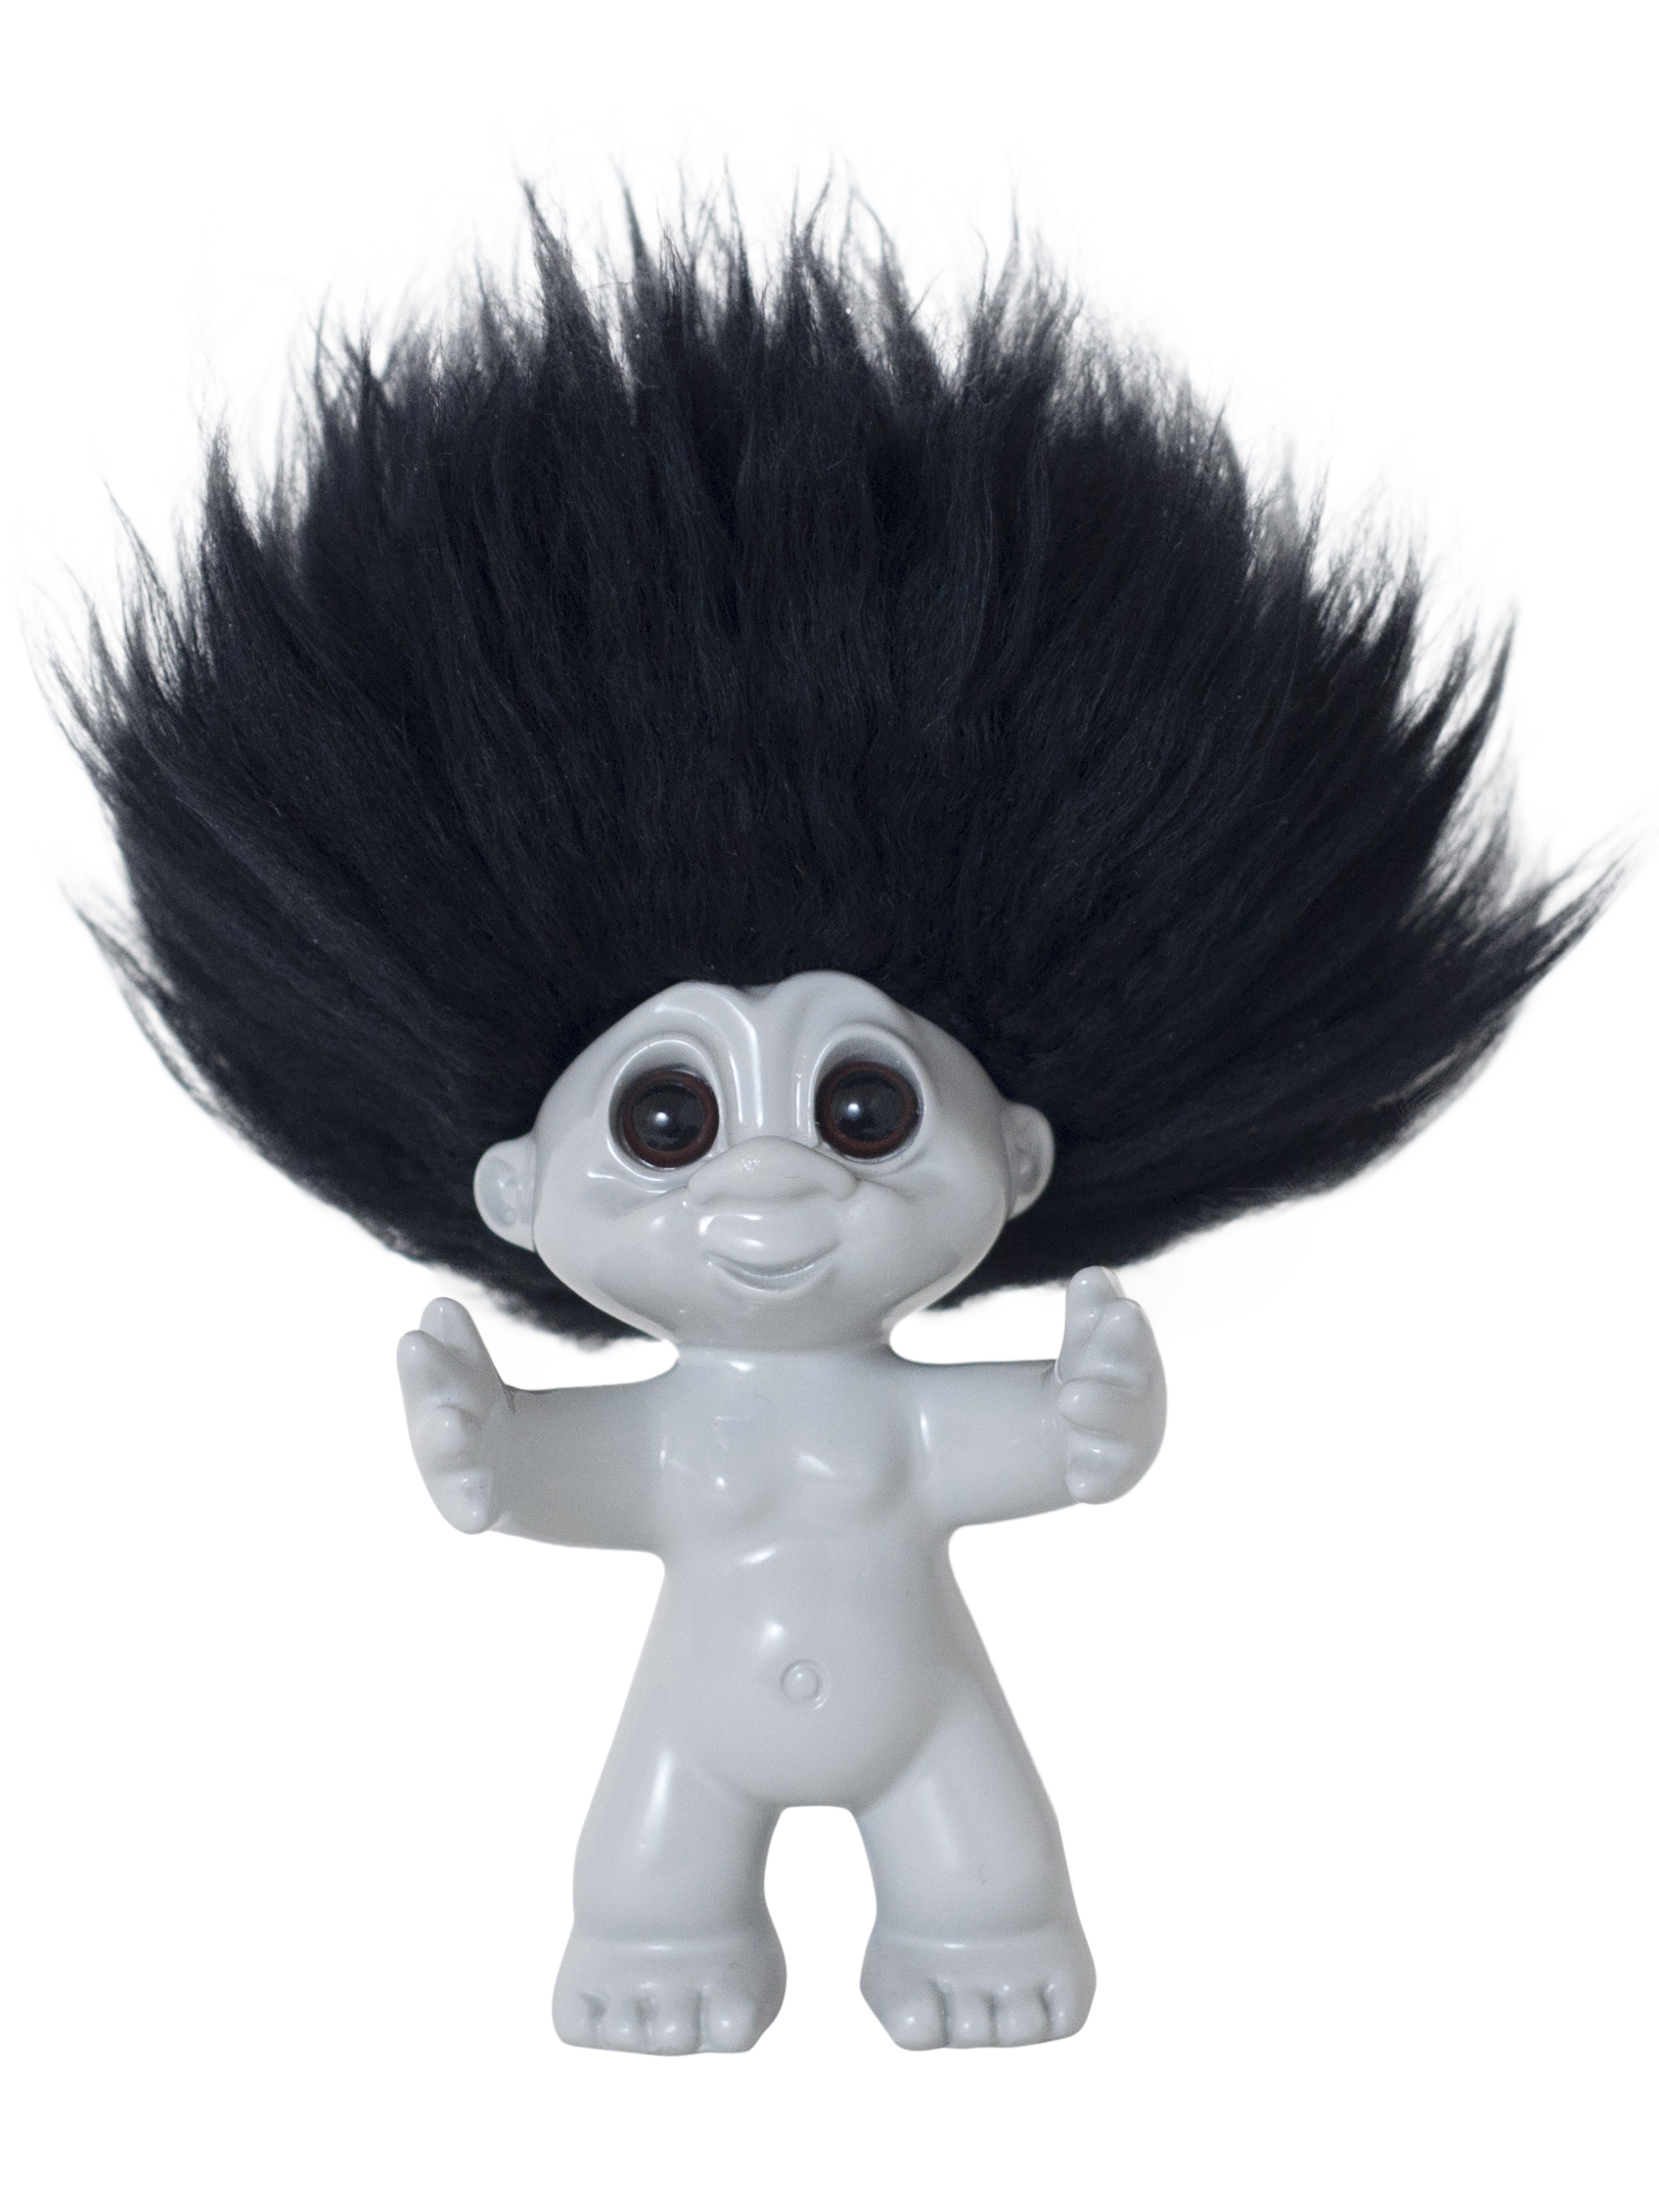 Goodluck Troll – Gray With Black Hair